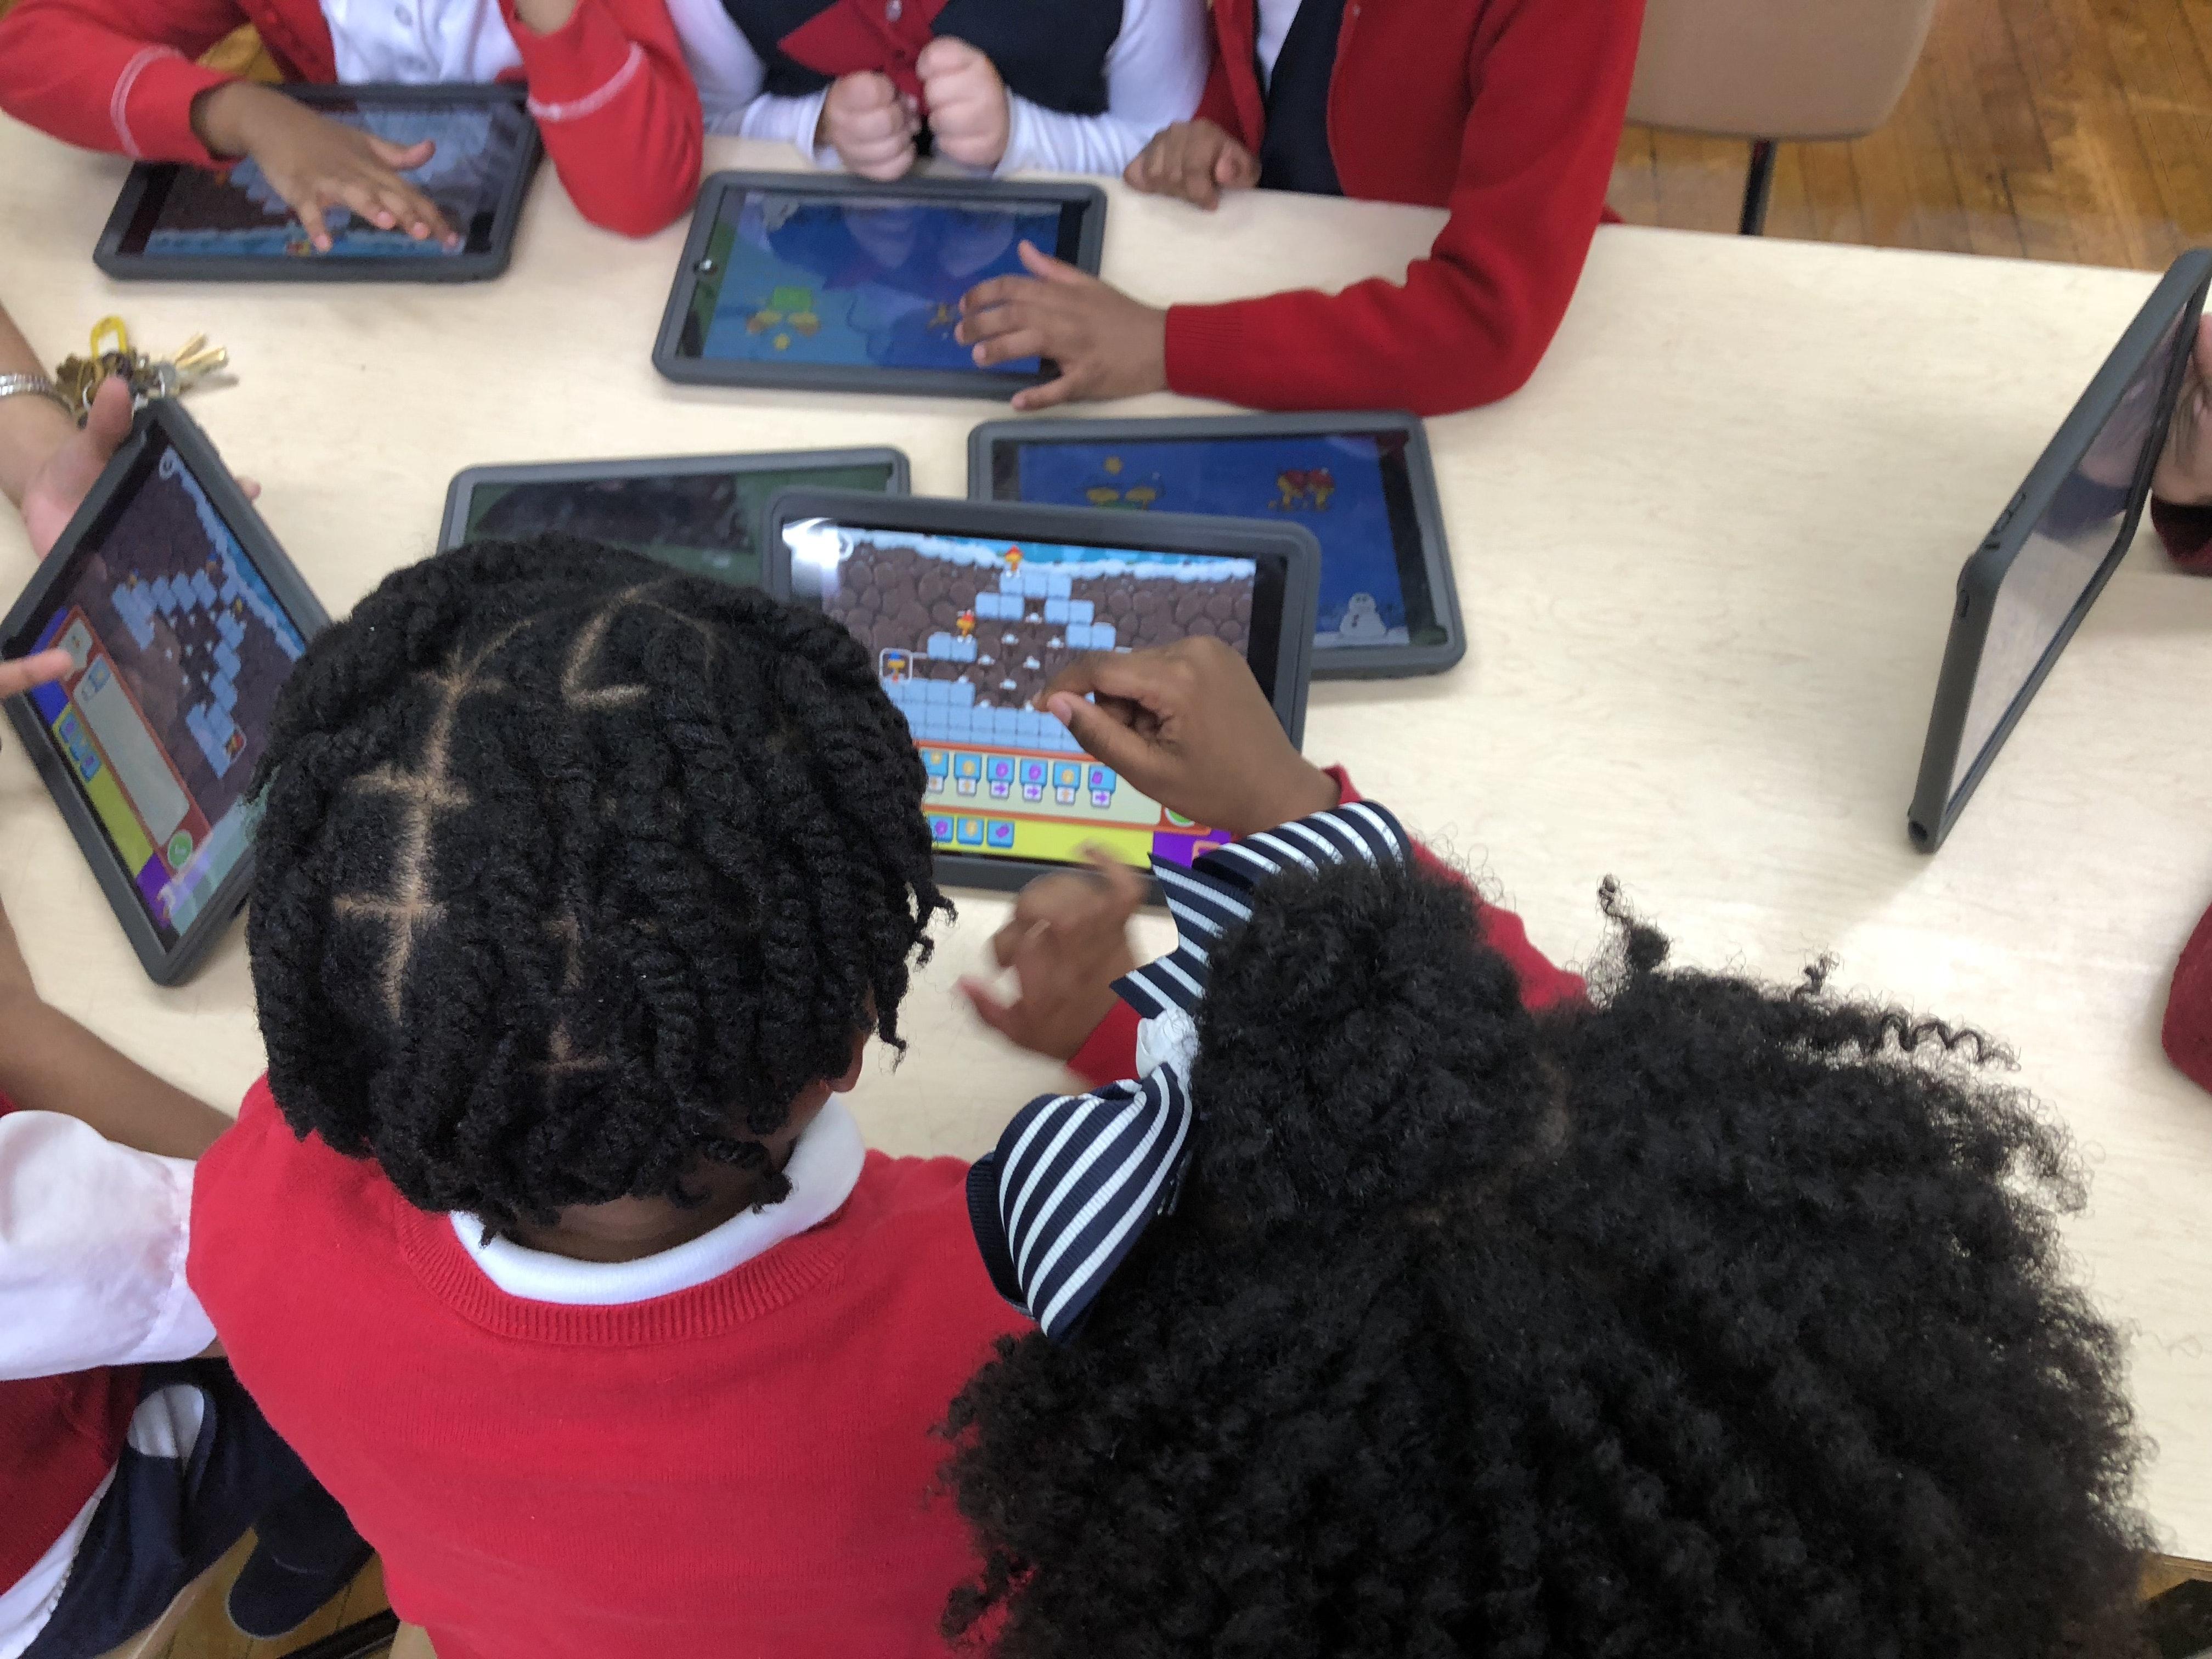 Screens off: Teaching Kids To Code